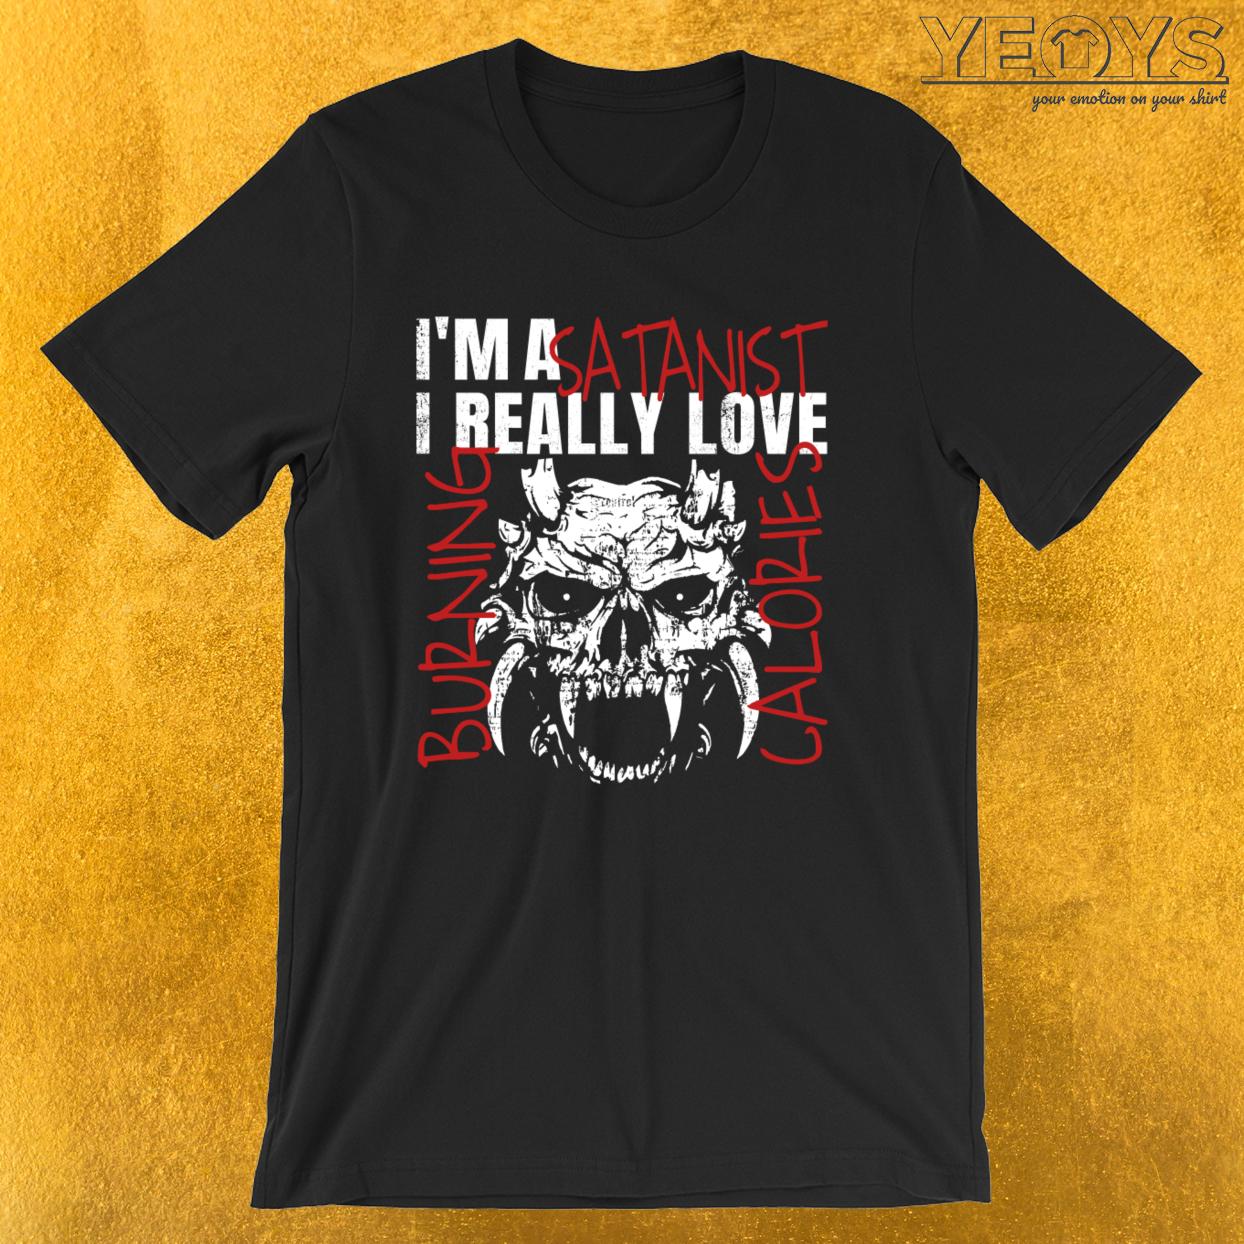 I'm A Satanist I Really Love Burning Calories – Funny Satanic Tee